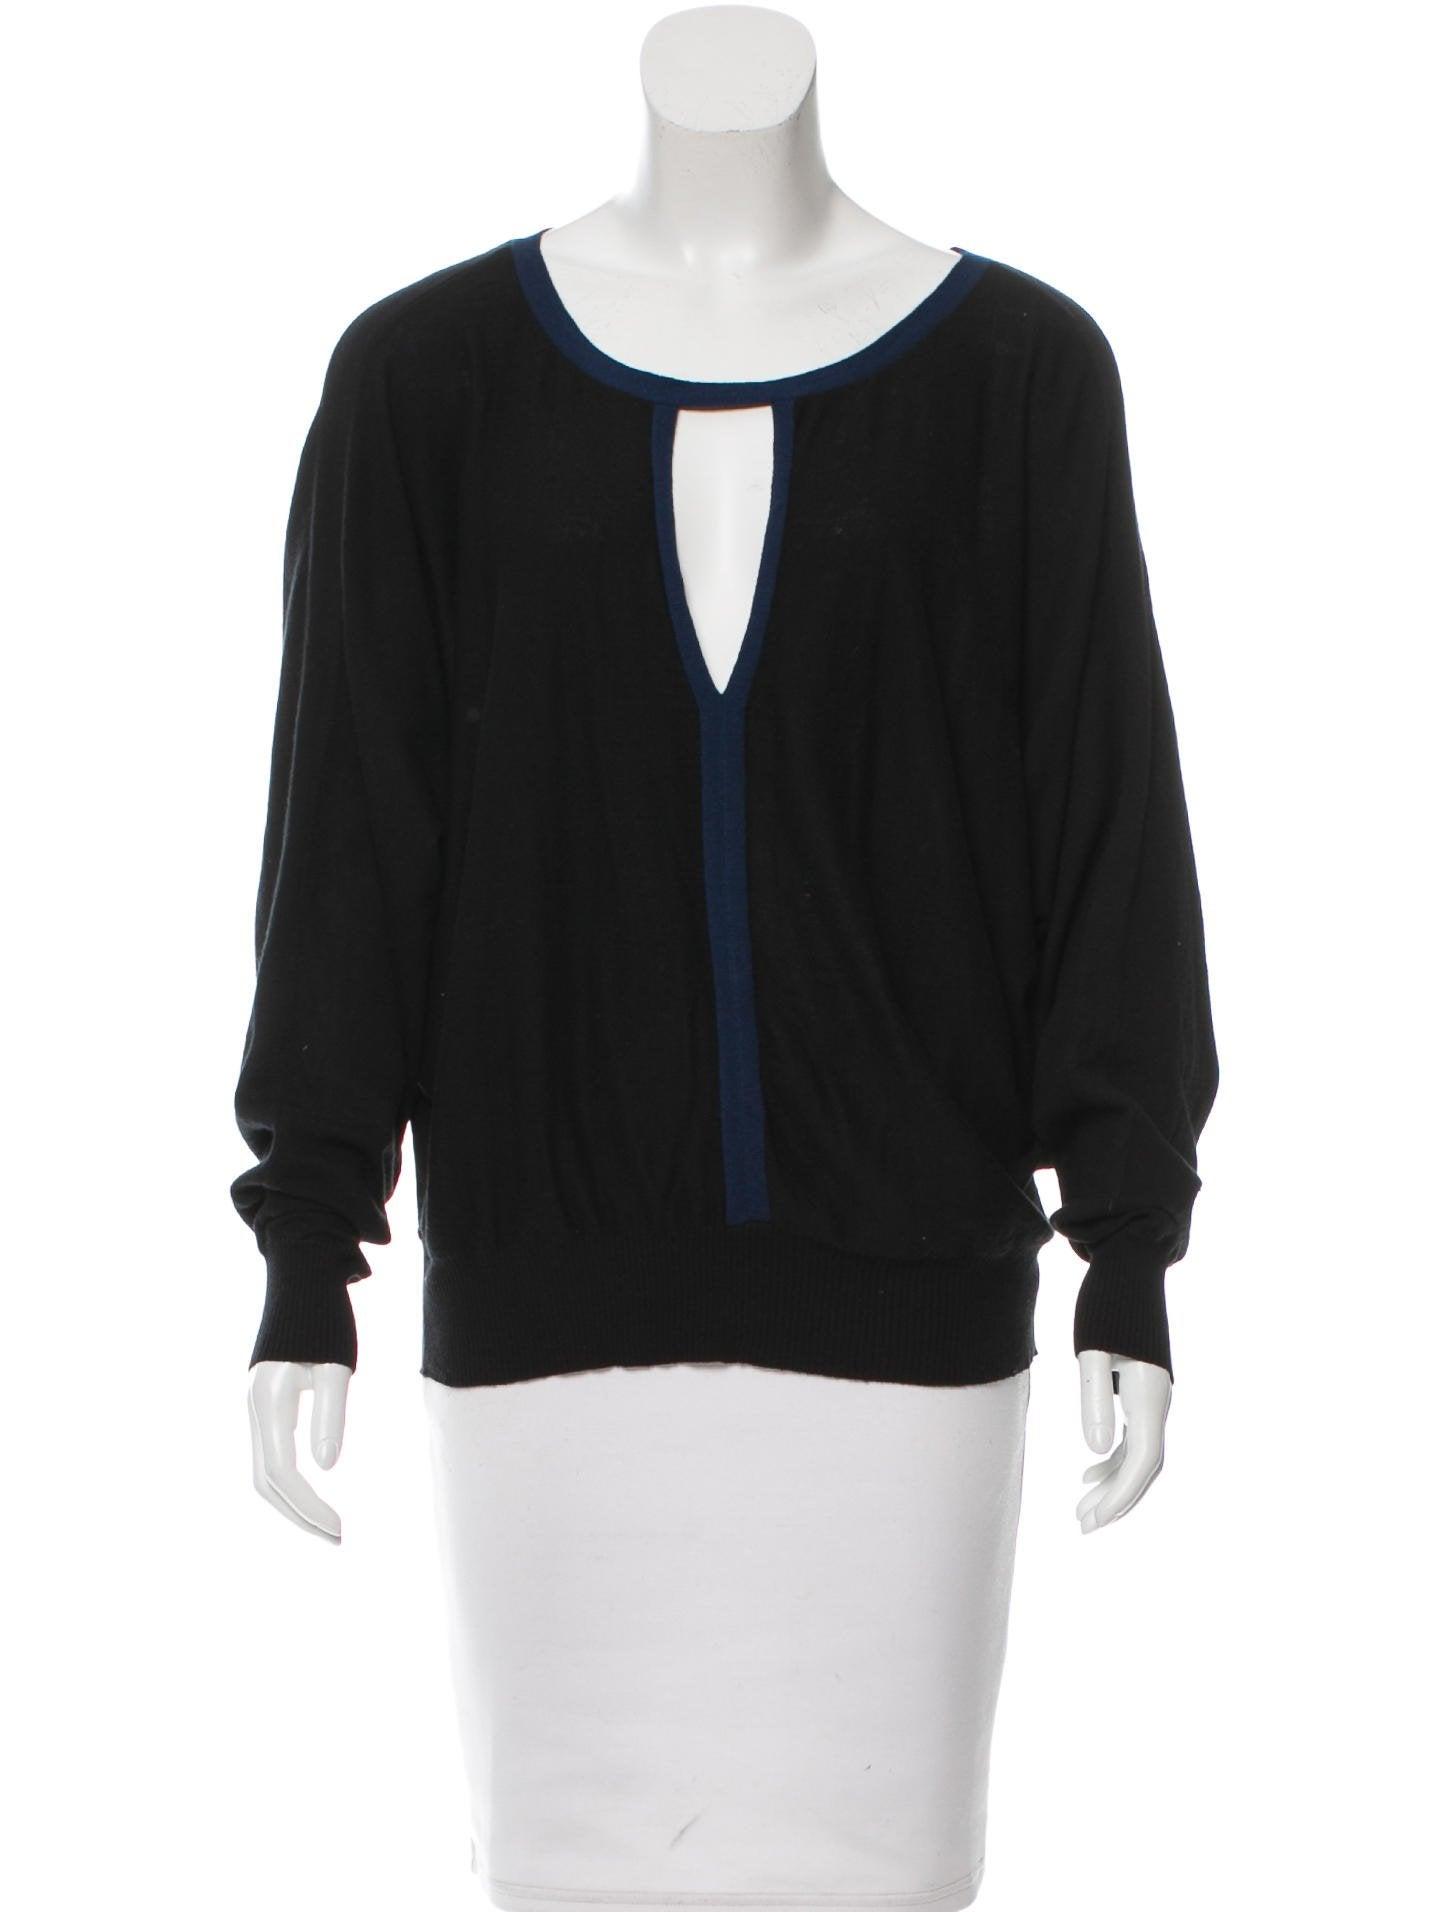 Knitting Pattern For Dolman Sleeve Sweater : Elizabeth and James Knit Dolman Sleeve Sweater - Clothing ...